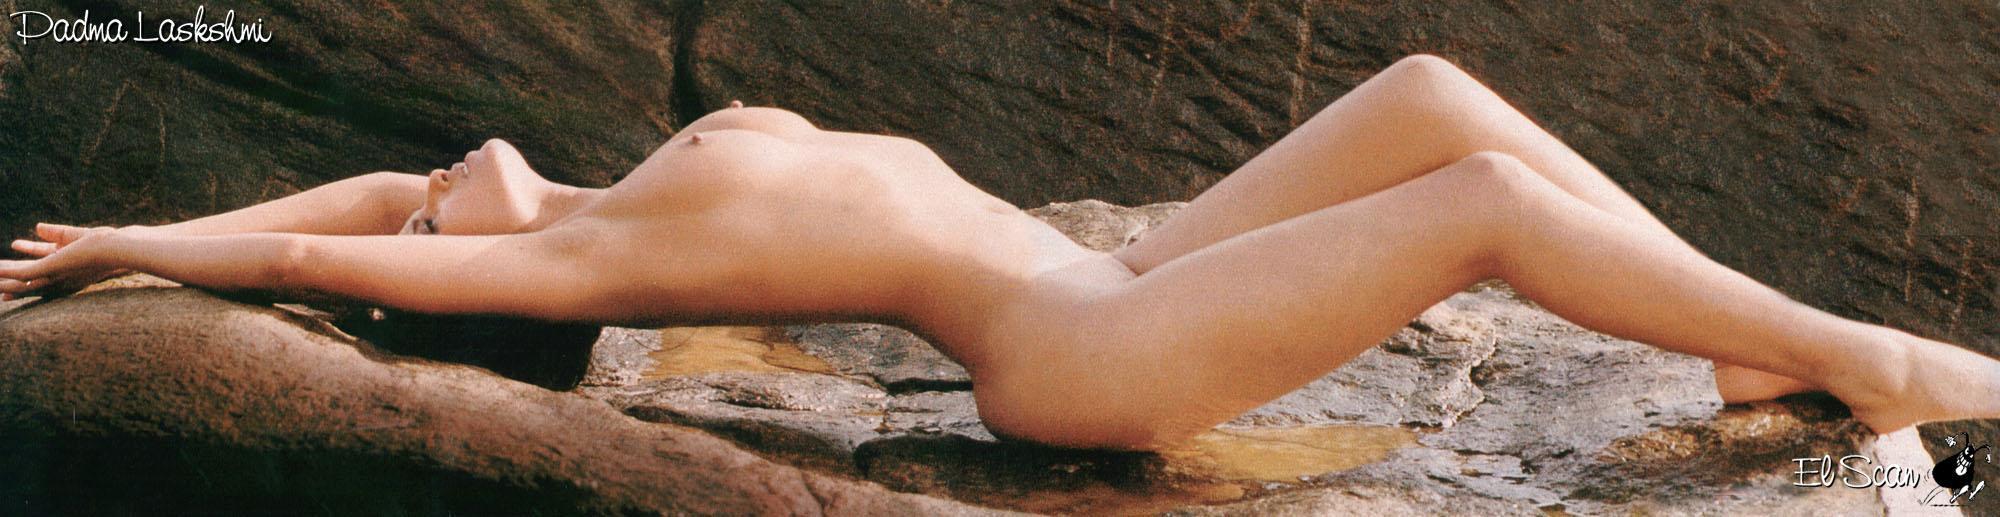 Padma lakshmi nude, naked